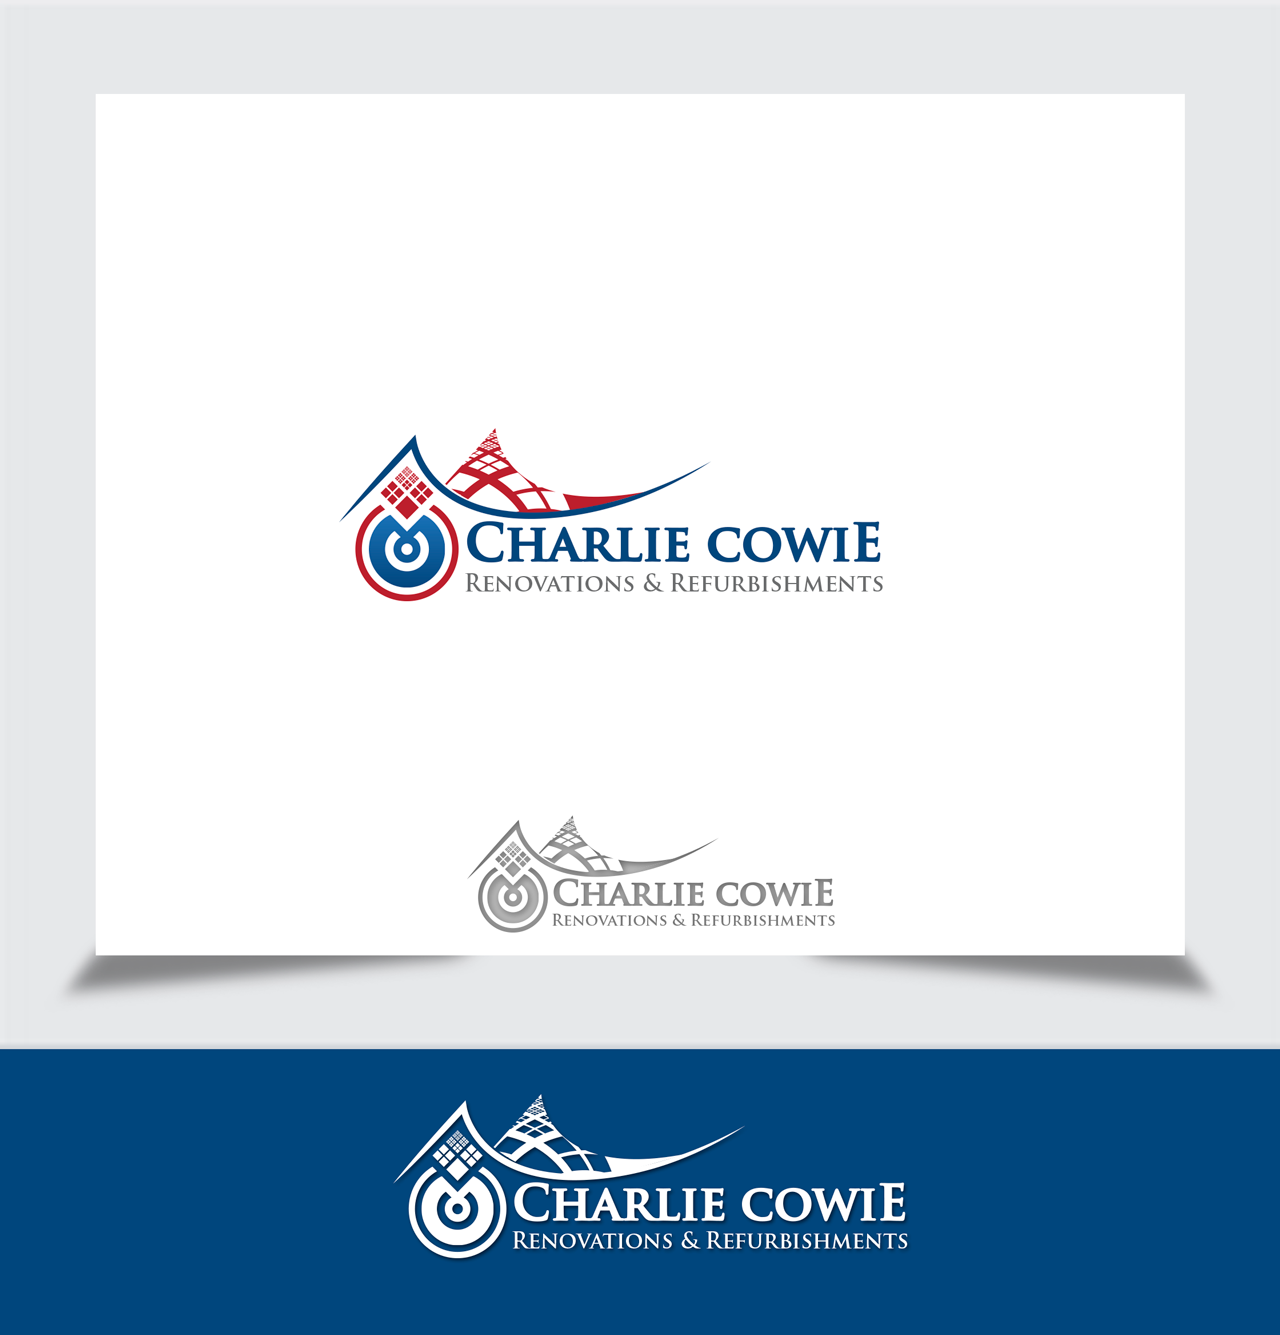 Logo Design by Tajammul Hussain - Entry No. 49 in the Logo Design Contest Charlie Cowie Renovations & Refurbishments Logo Design.